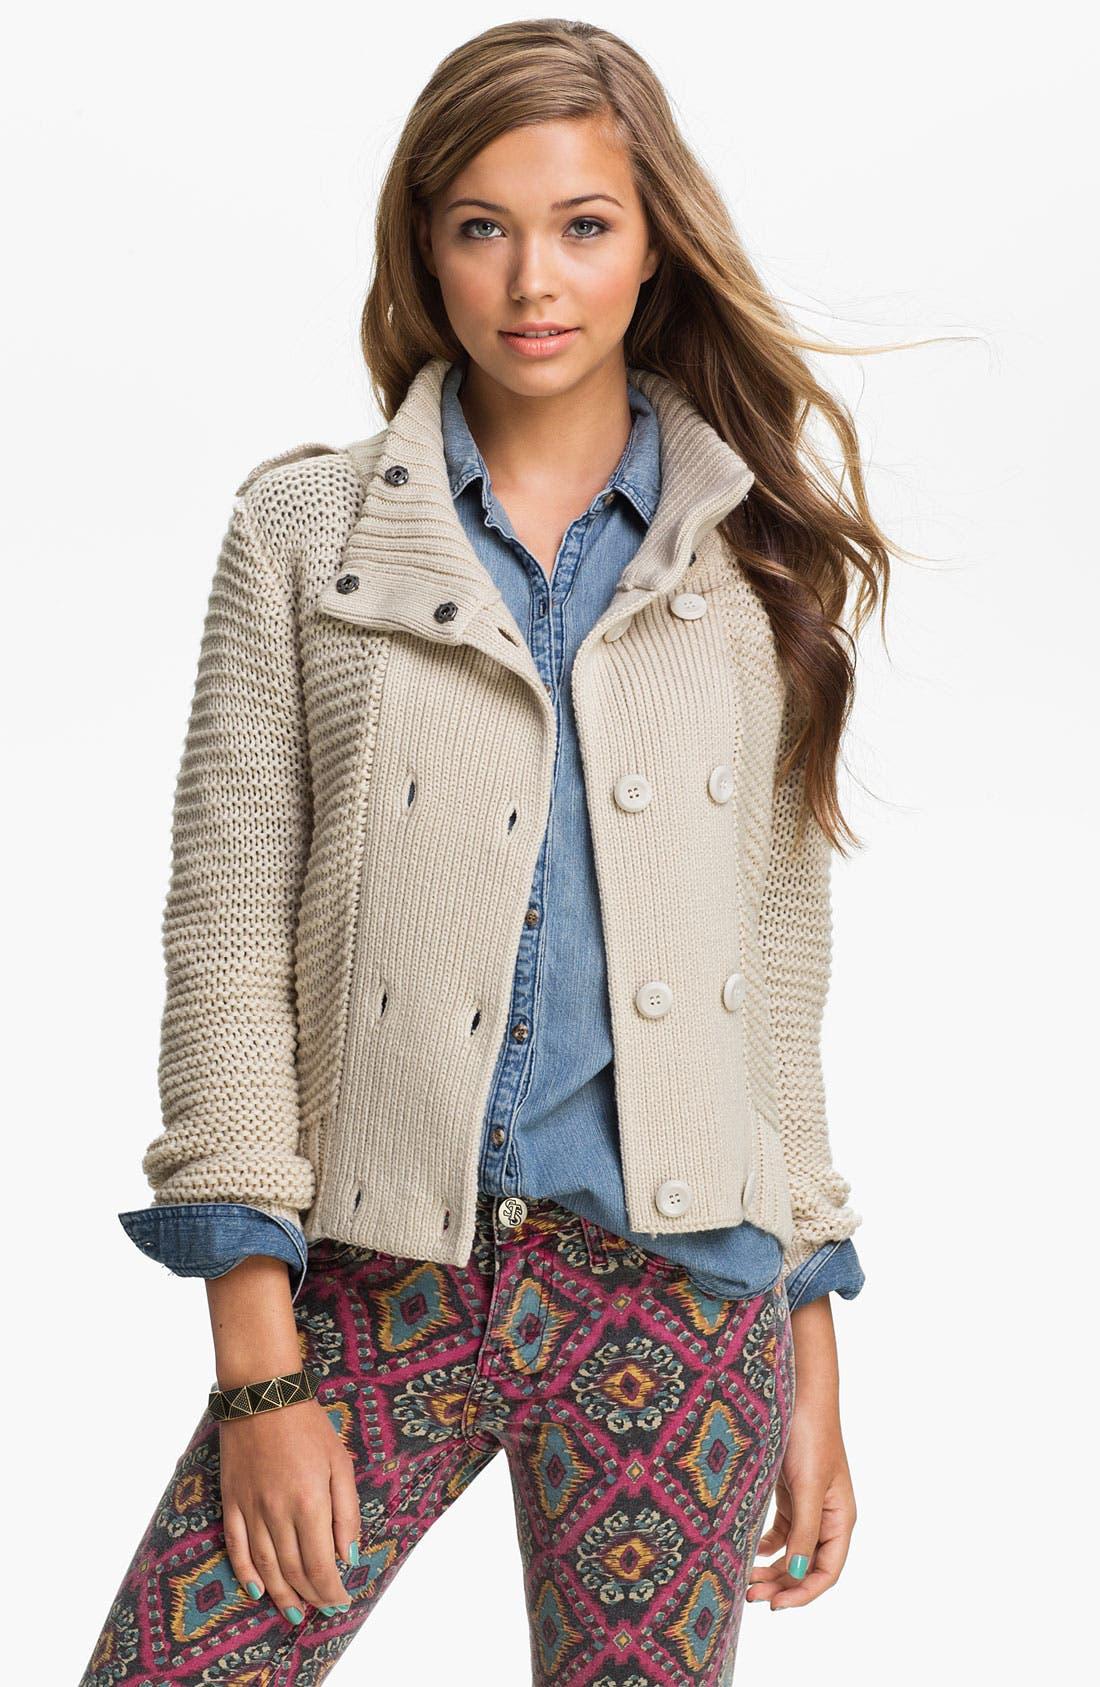 Alternate Image 1 Selected - Rubbish® 'Links' Sweater Jacket (Juniors)